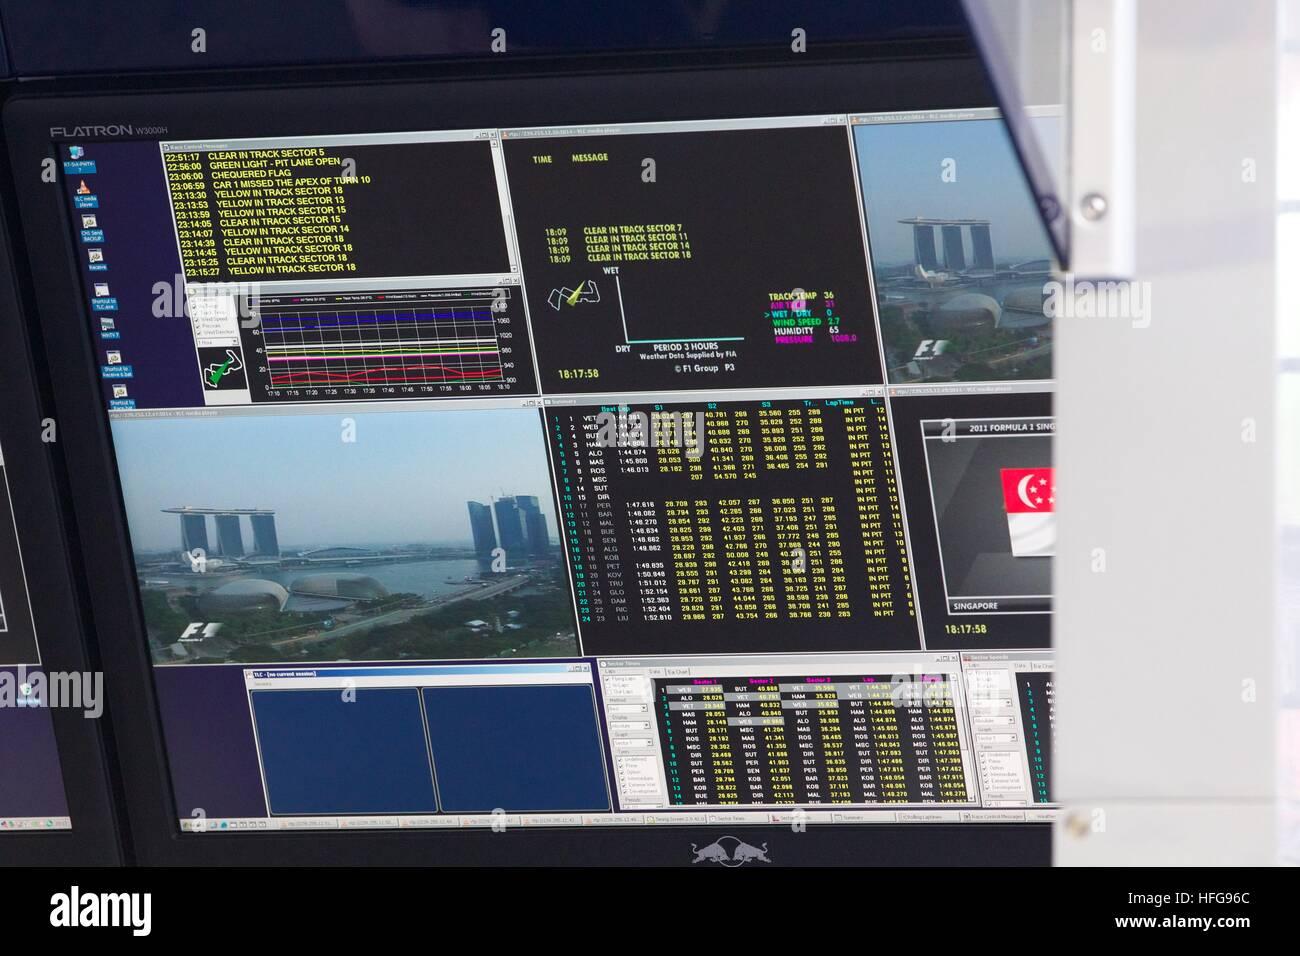 Singapore F1 grand prix formula one screen monitor data Stock Photo